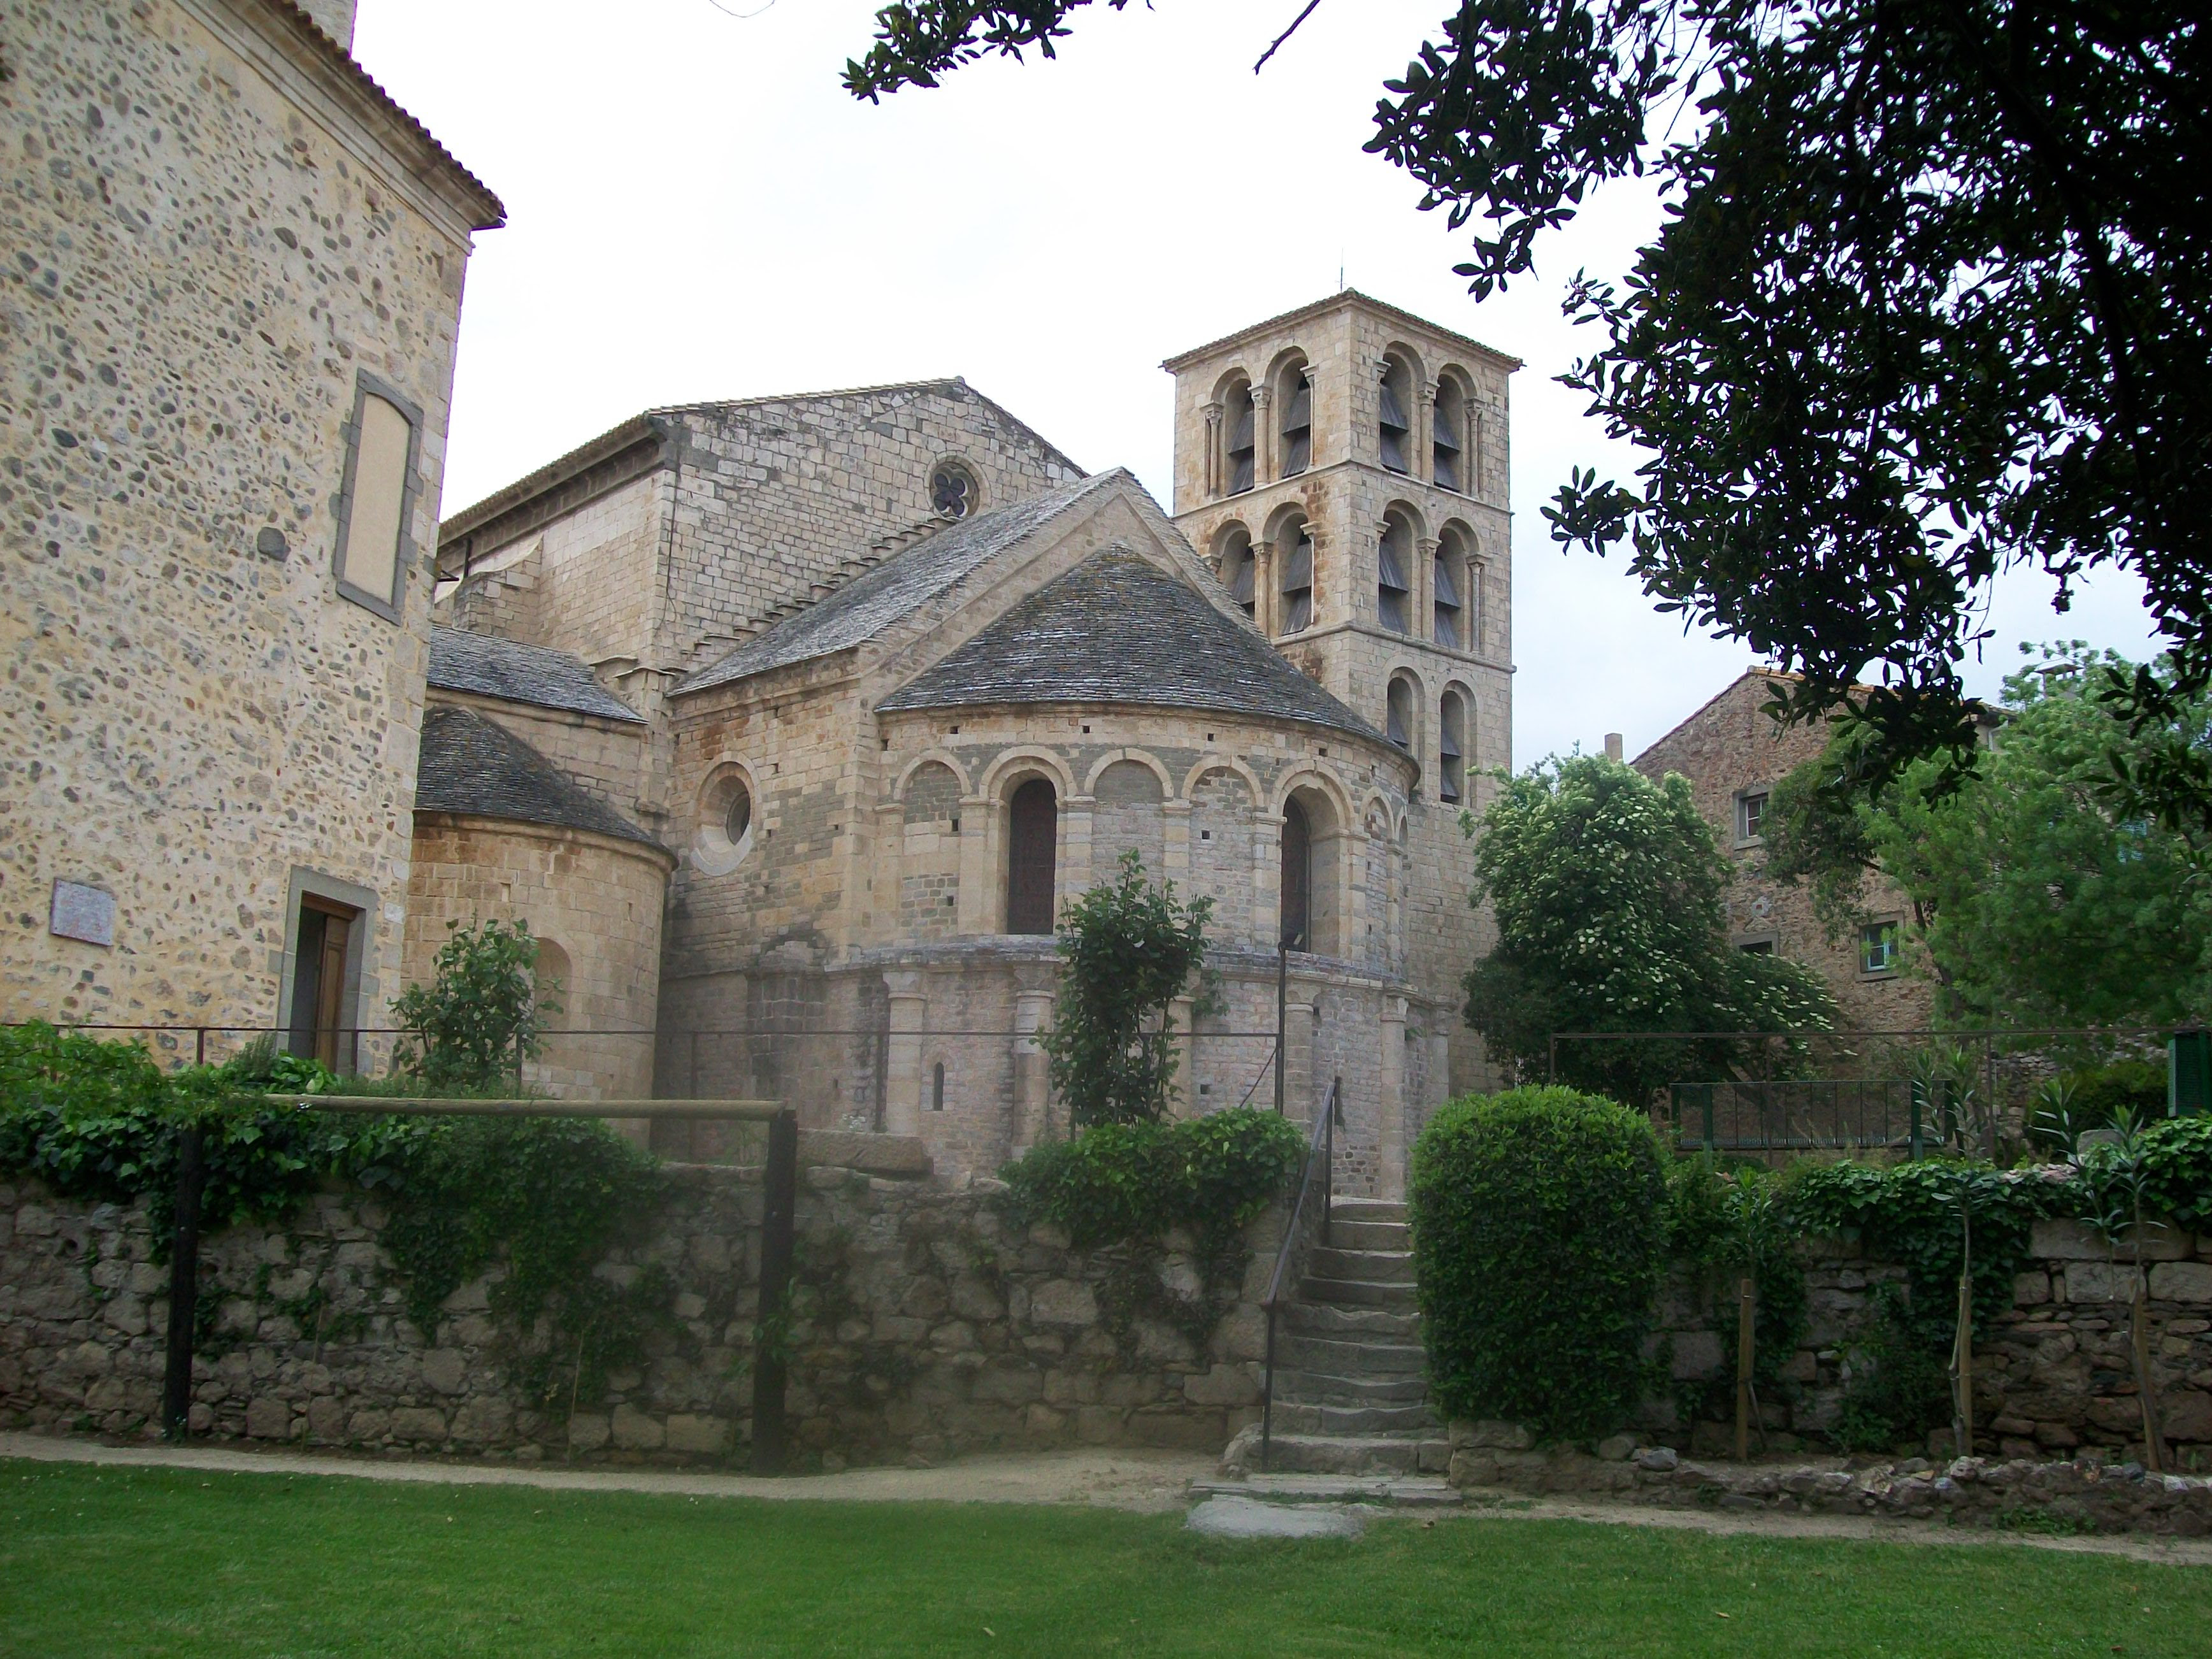 http://upload.wikimedia.org/wikipedia/commons/e/eb/Abbaye_de_Caunes-minervois.jpg